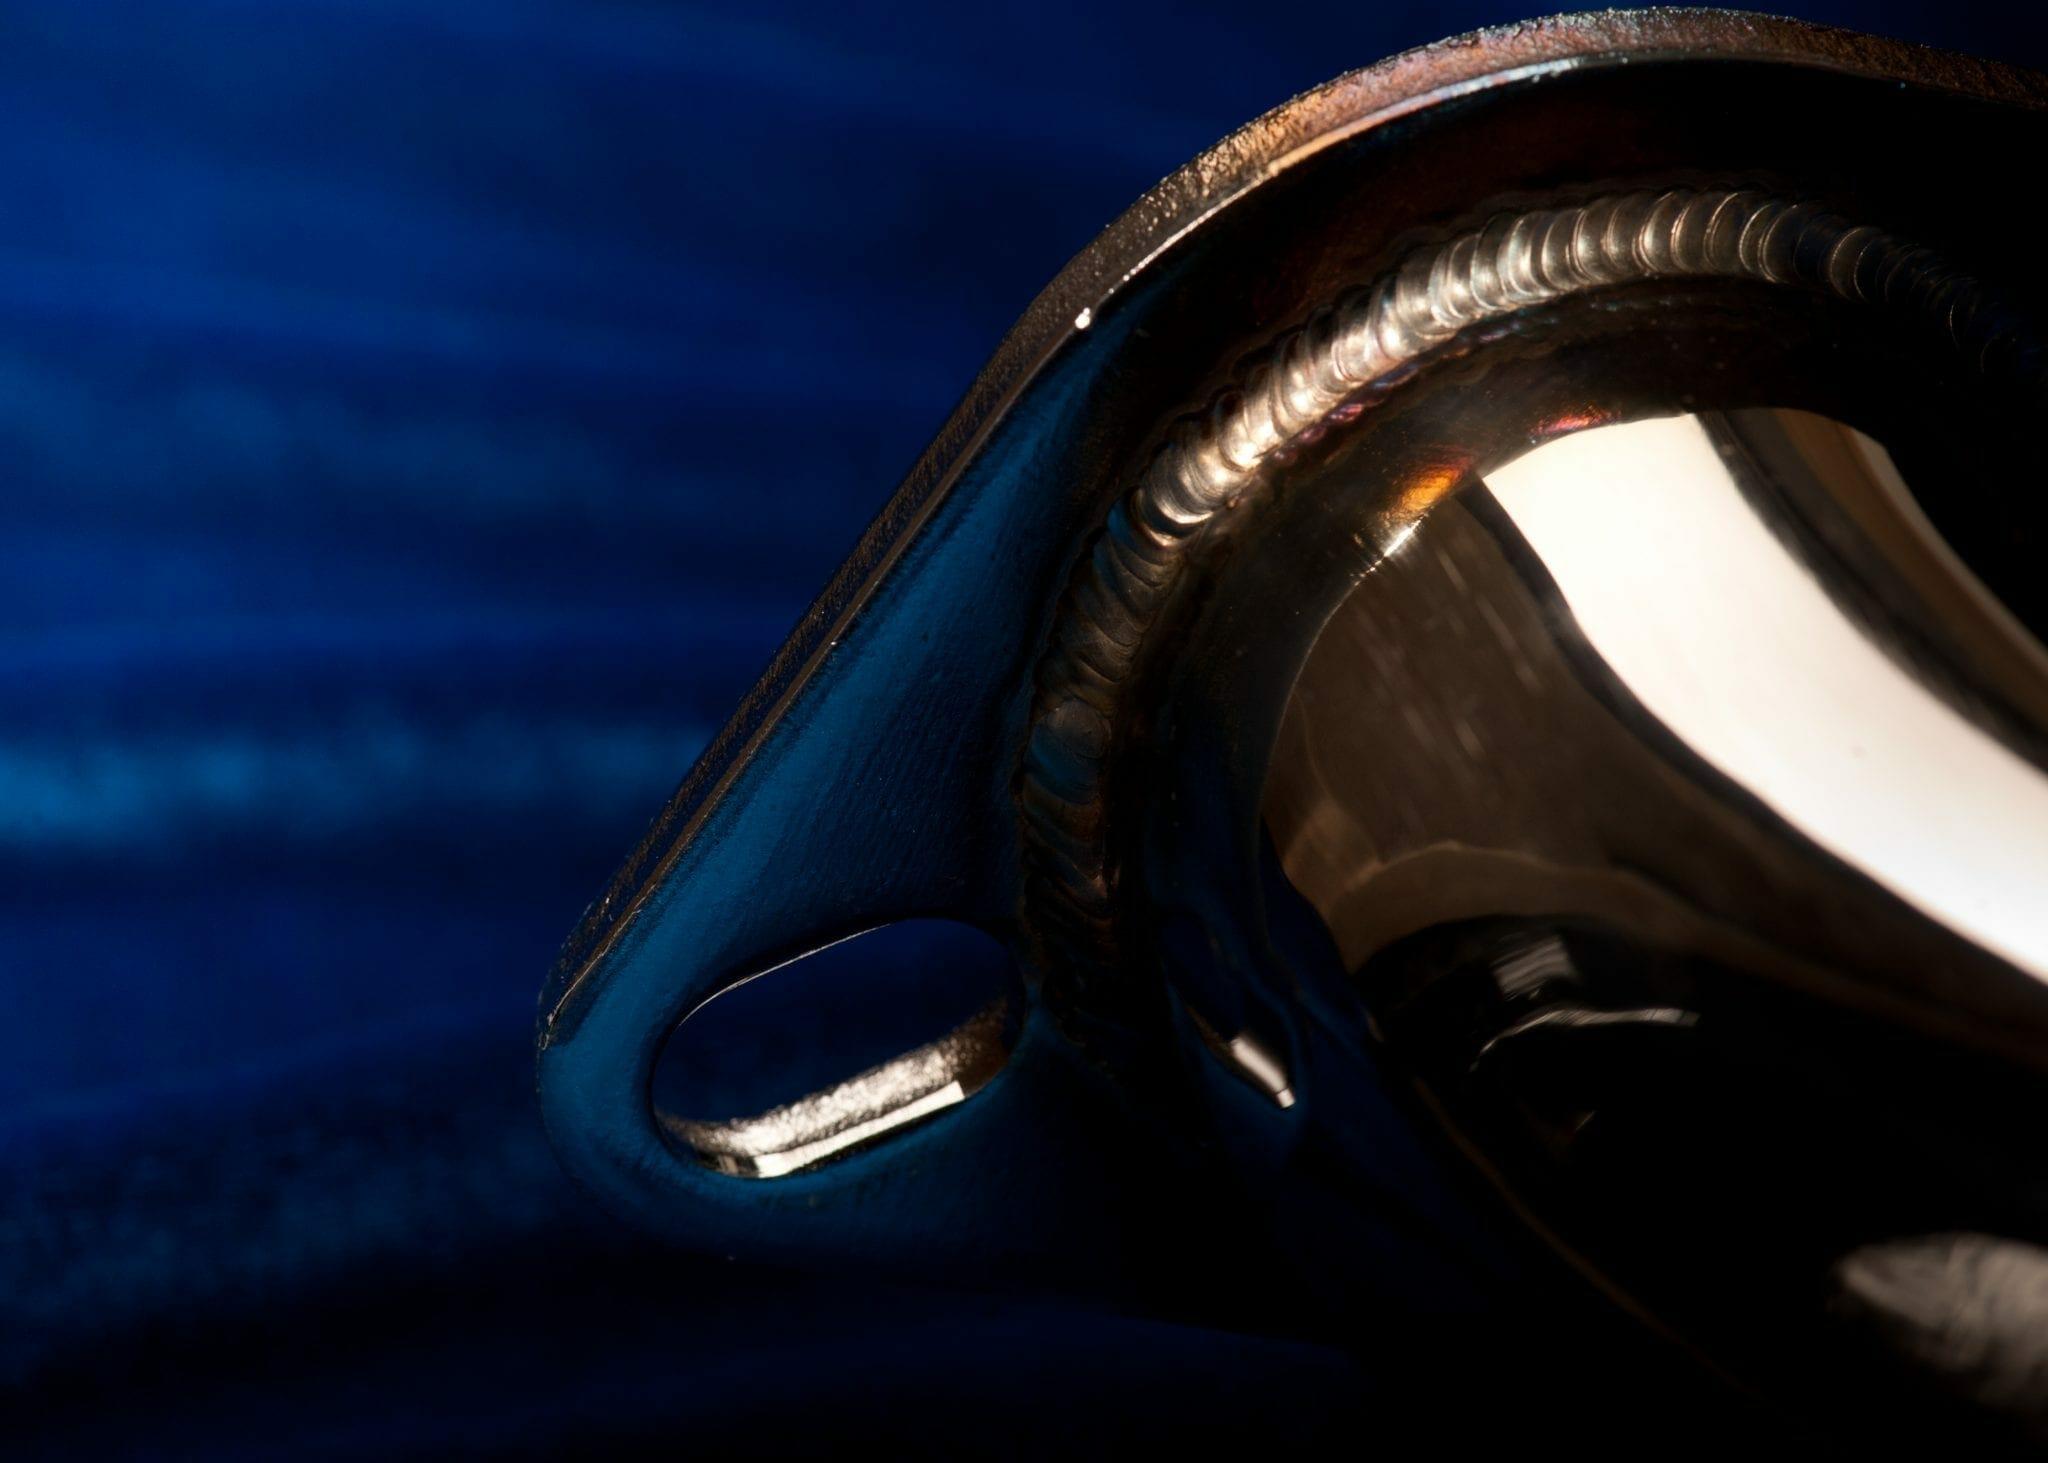 Infiniti G37 / Q60 Exhaust - Motordyne ShockWave)))